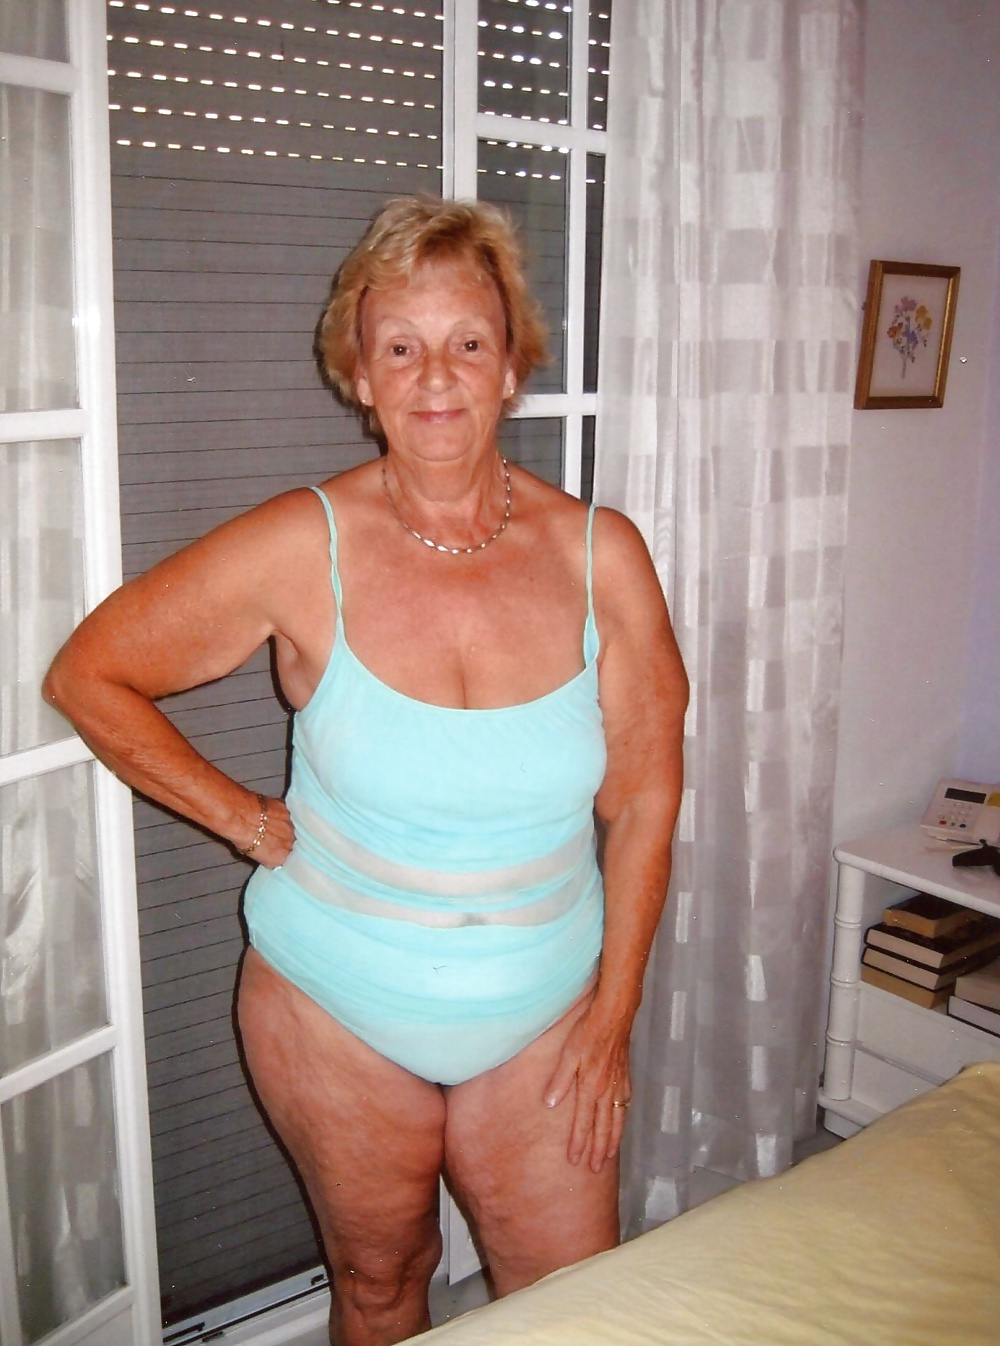 Lisa hartman nude pics